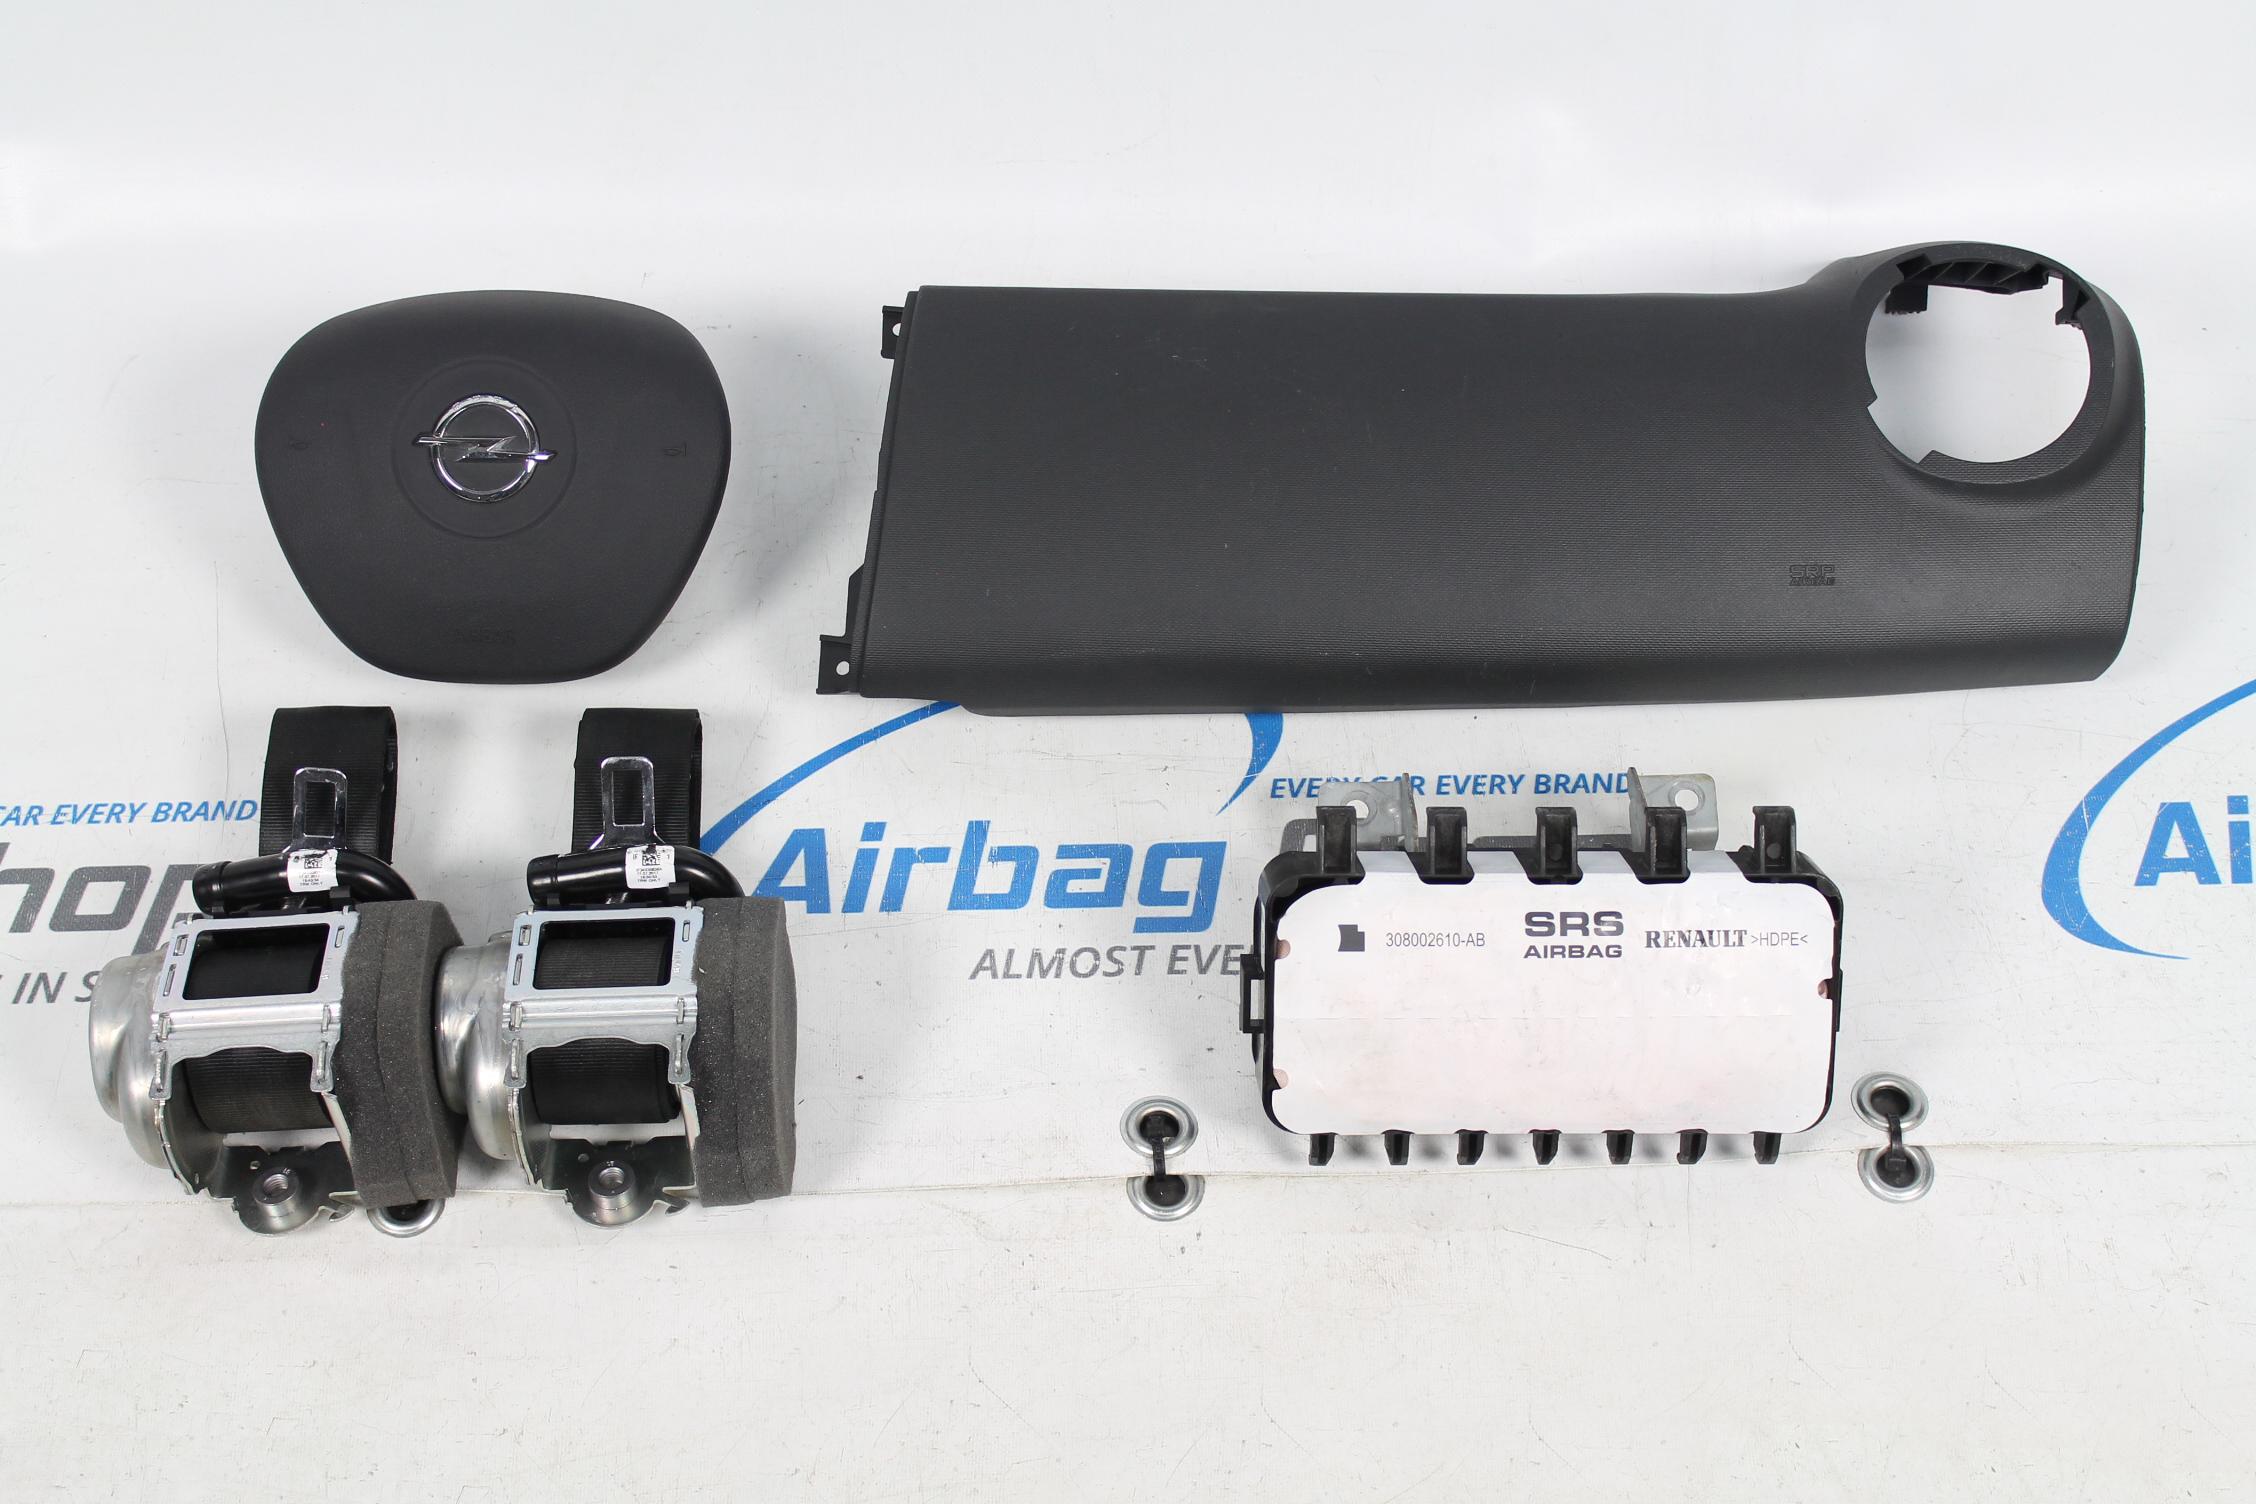 airbag set dashboard panel black opel vivaro 2014. Black Bedroom Furniture Sets. Home Design Ideas